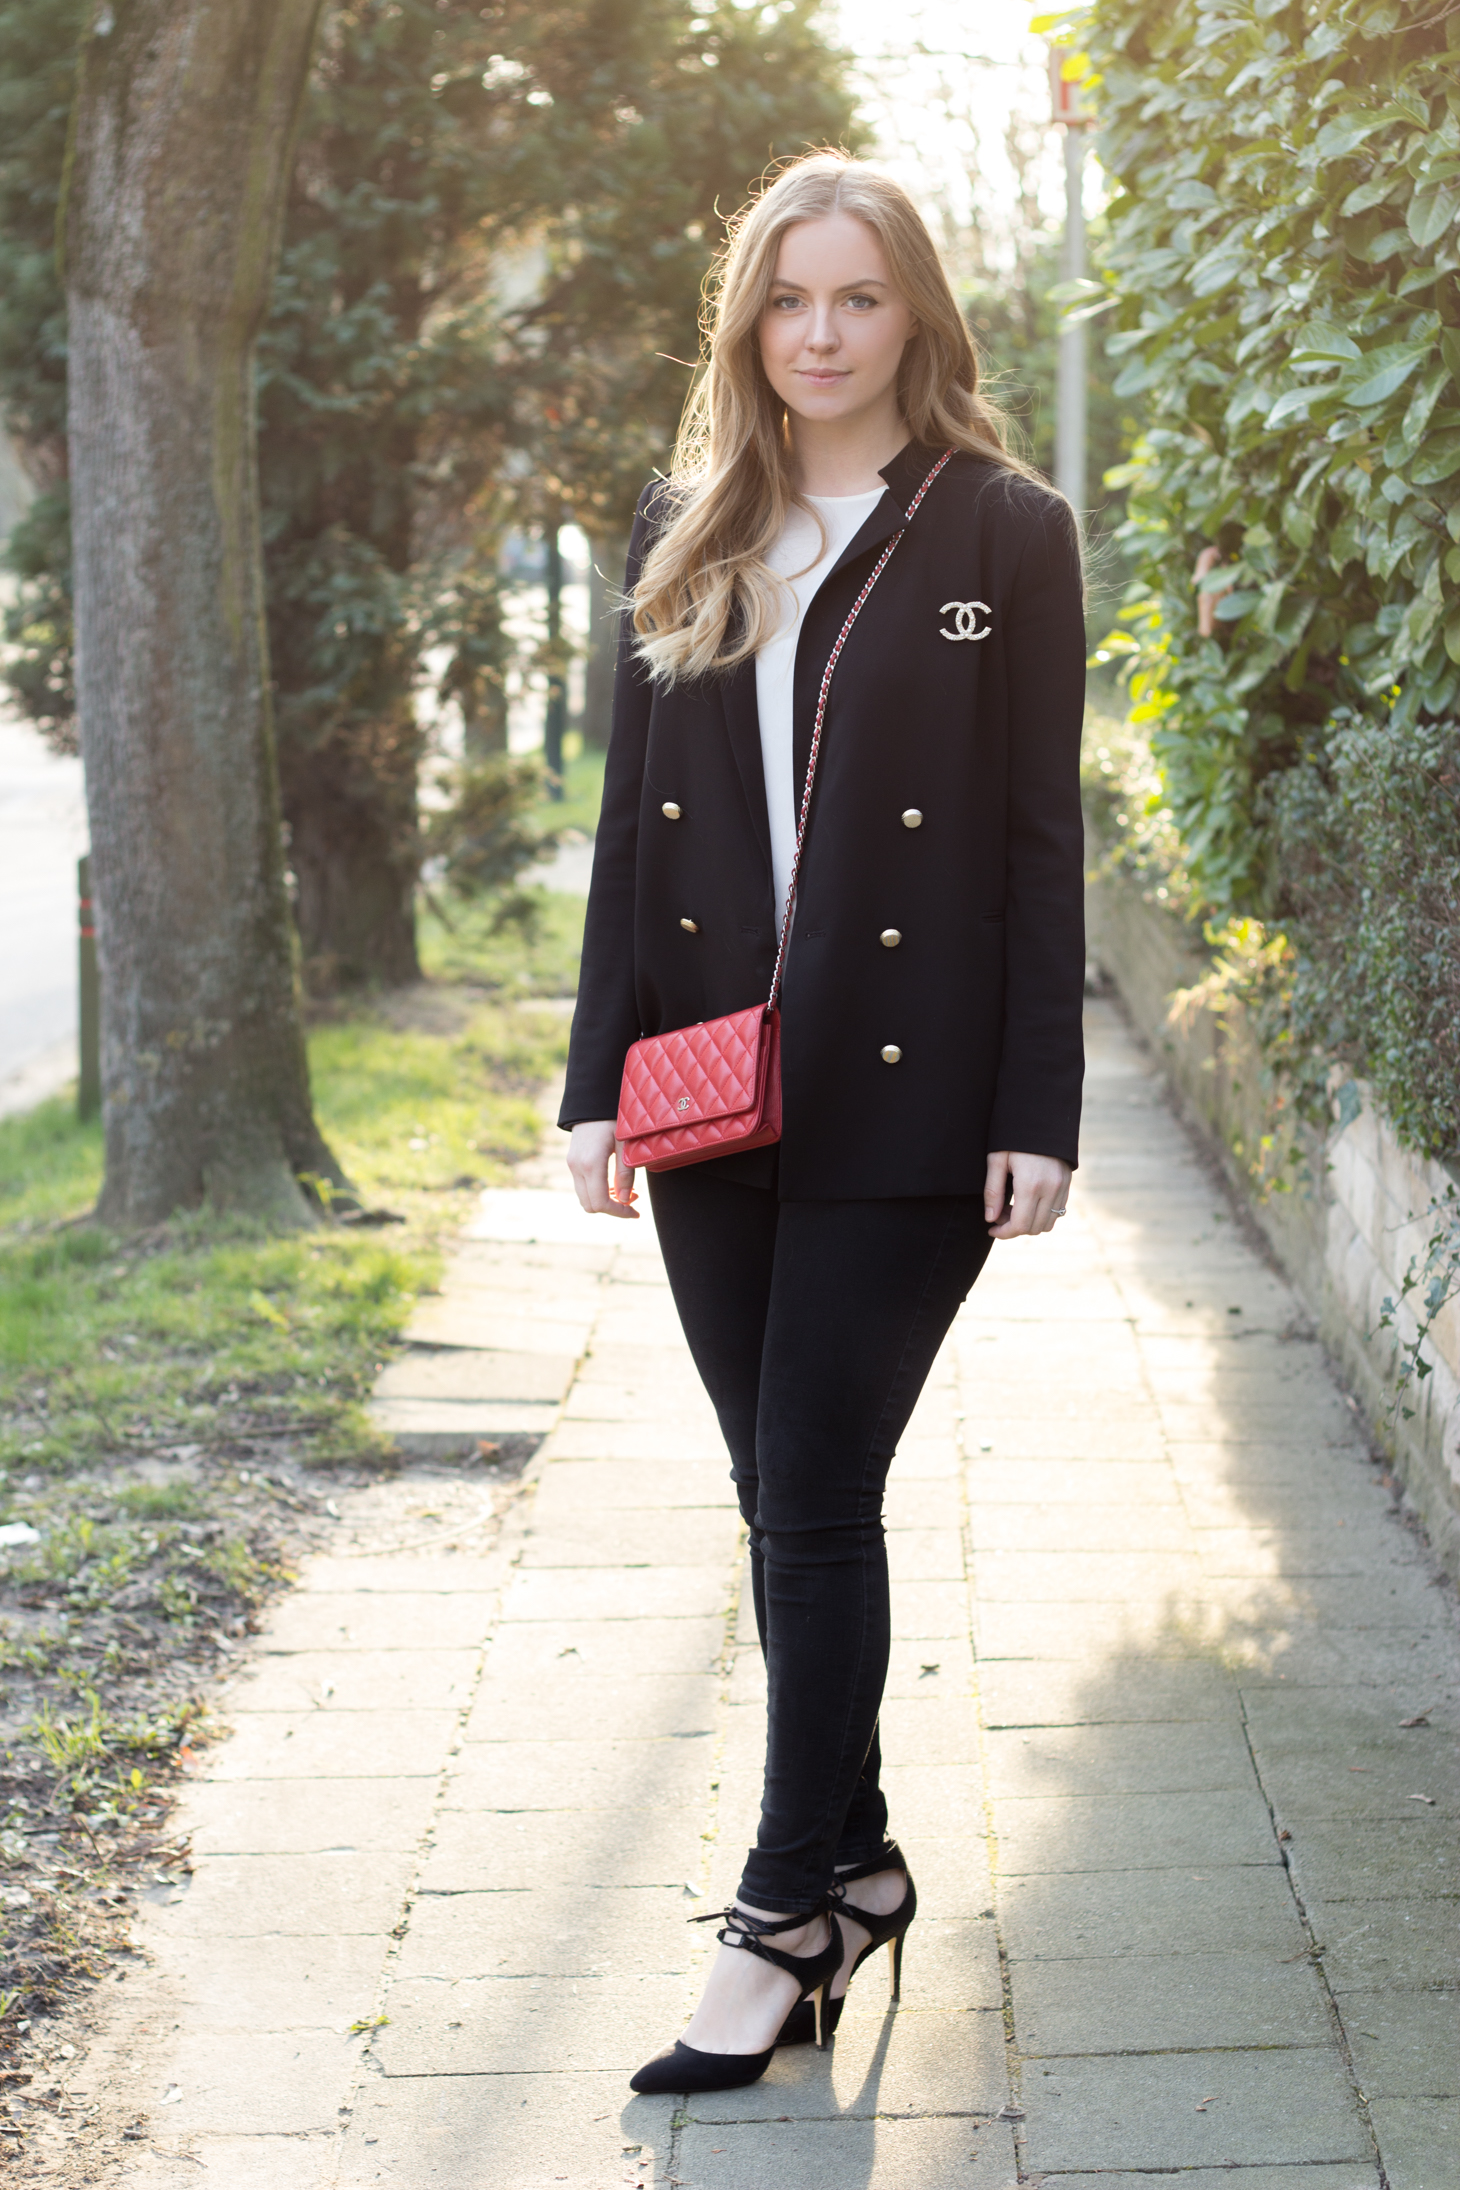 Chanel bag + brooch